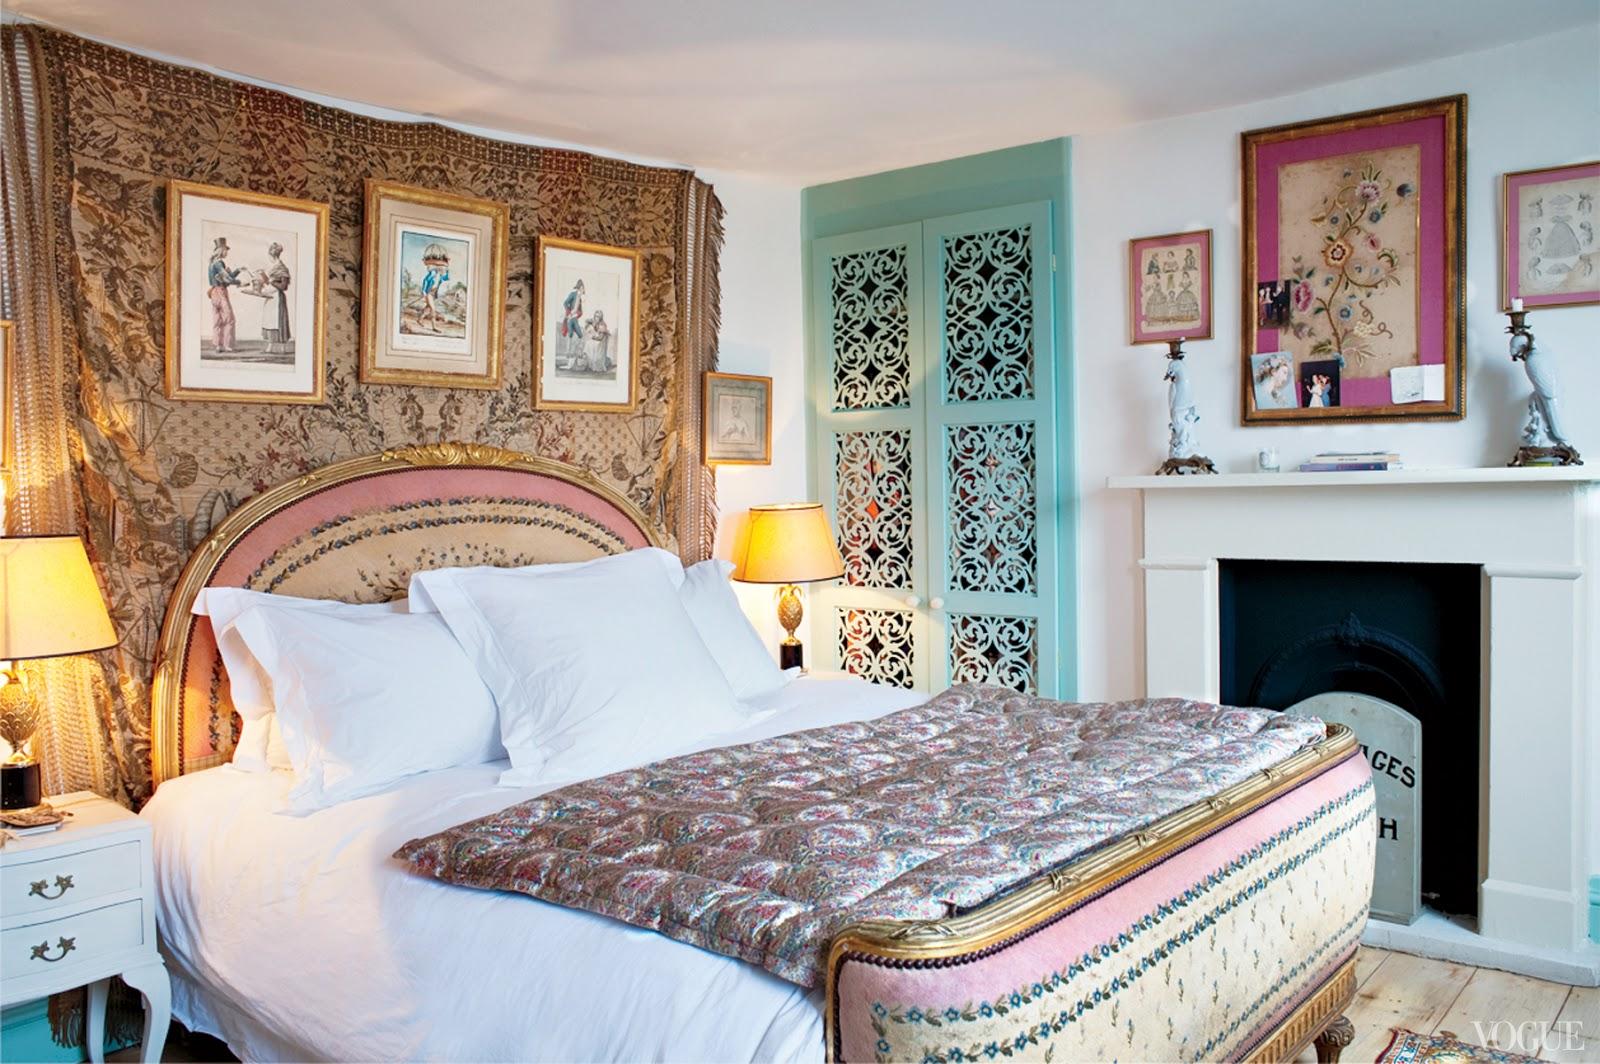 jhbggbideas-home-interior-design-bohemian-style-b